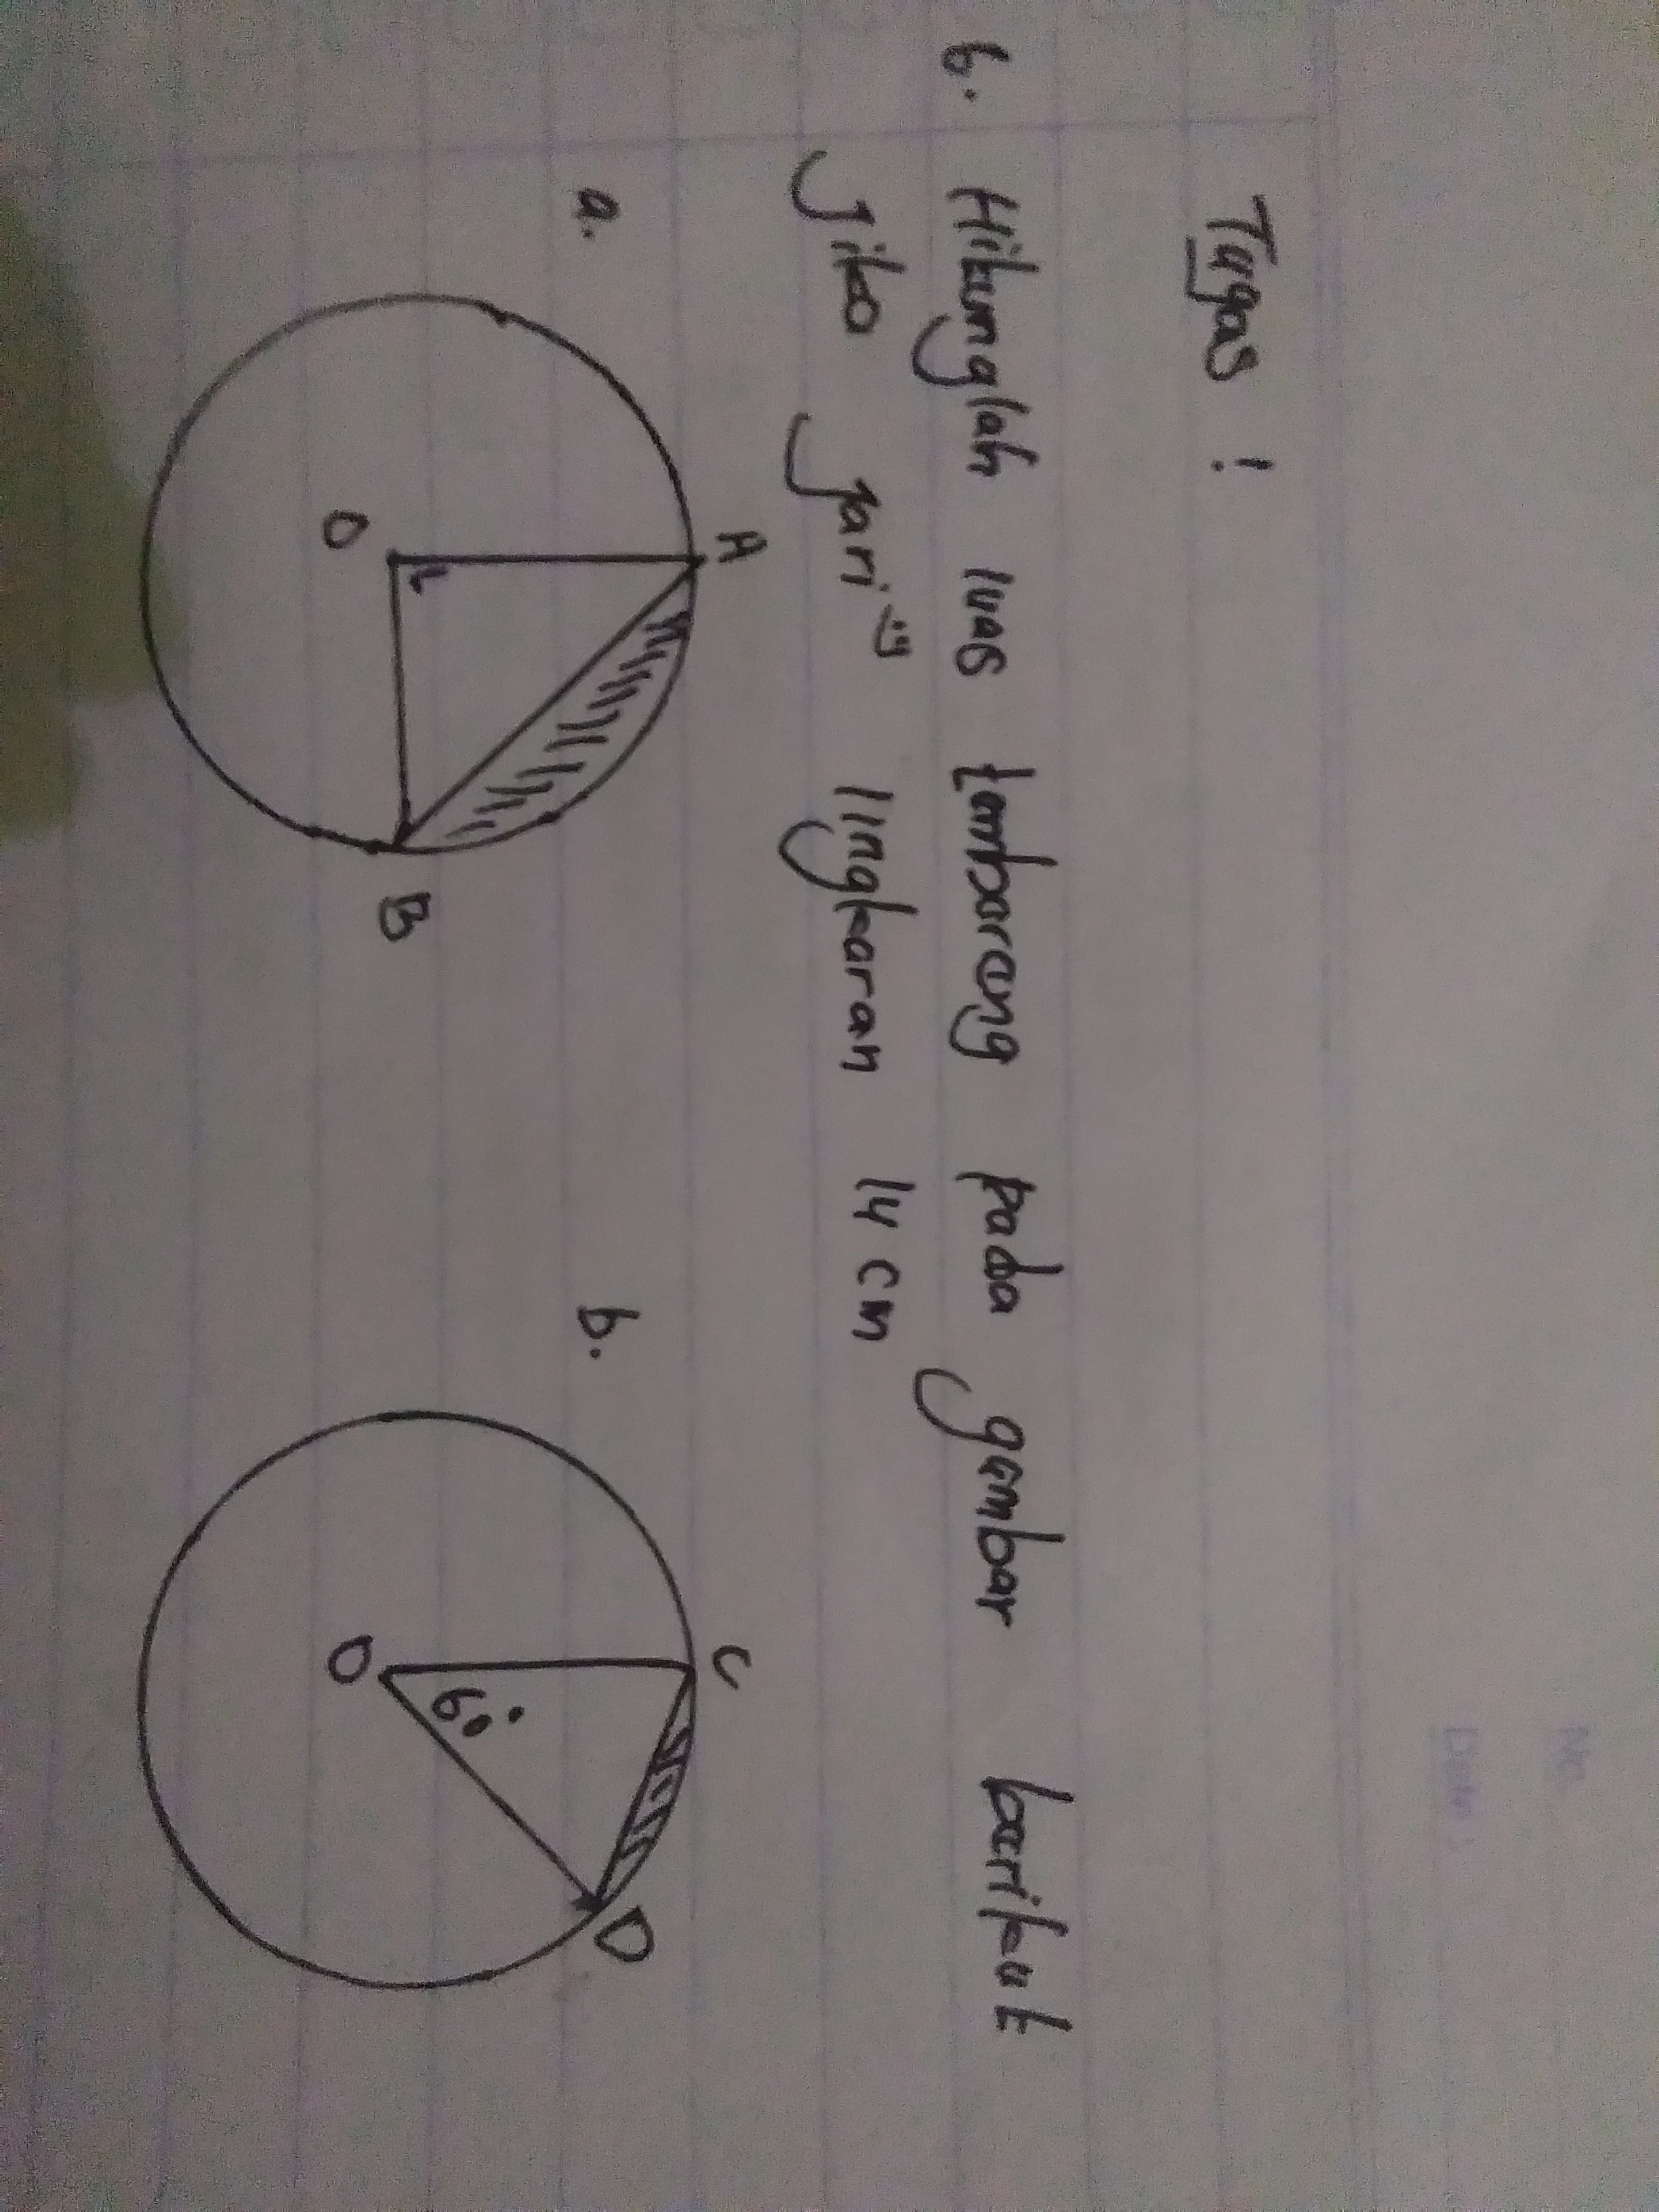 Luas Tembereng Lingkaran : tembereng, lingkaran, Hitunglah, Tembereng, Gambar, Berikut, Jari